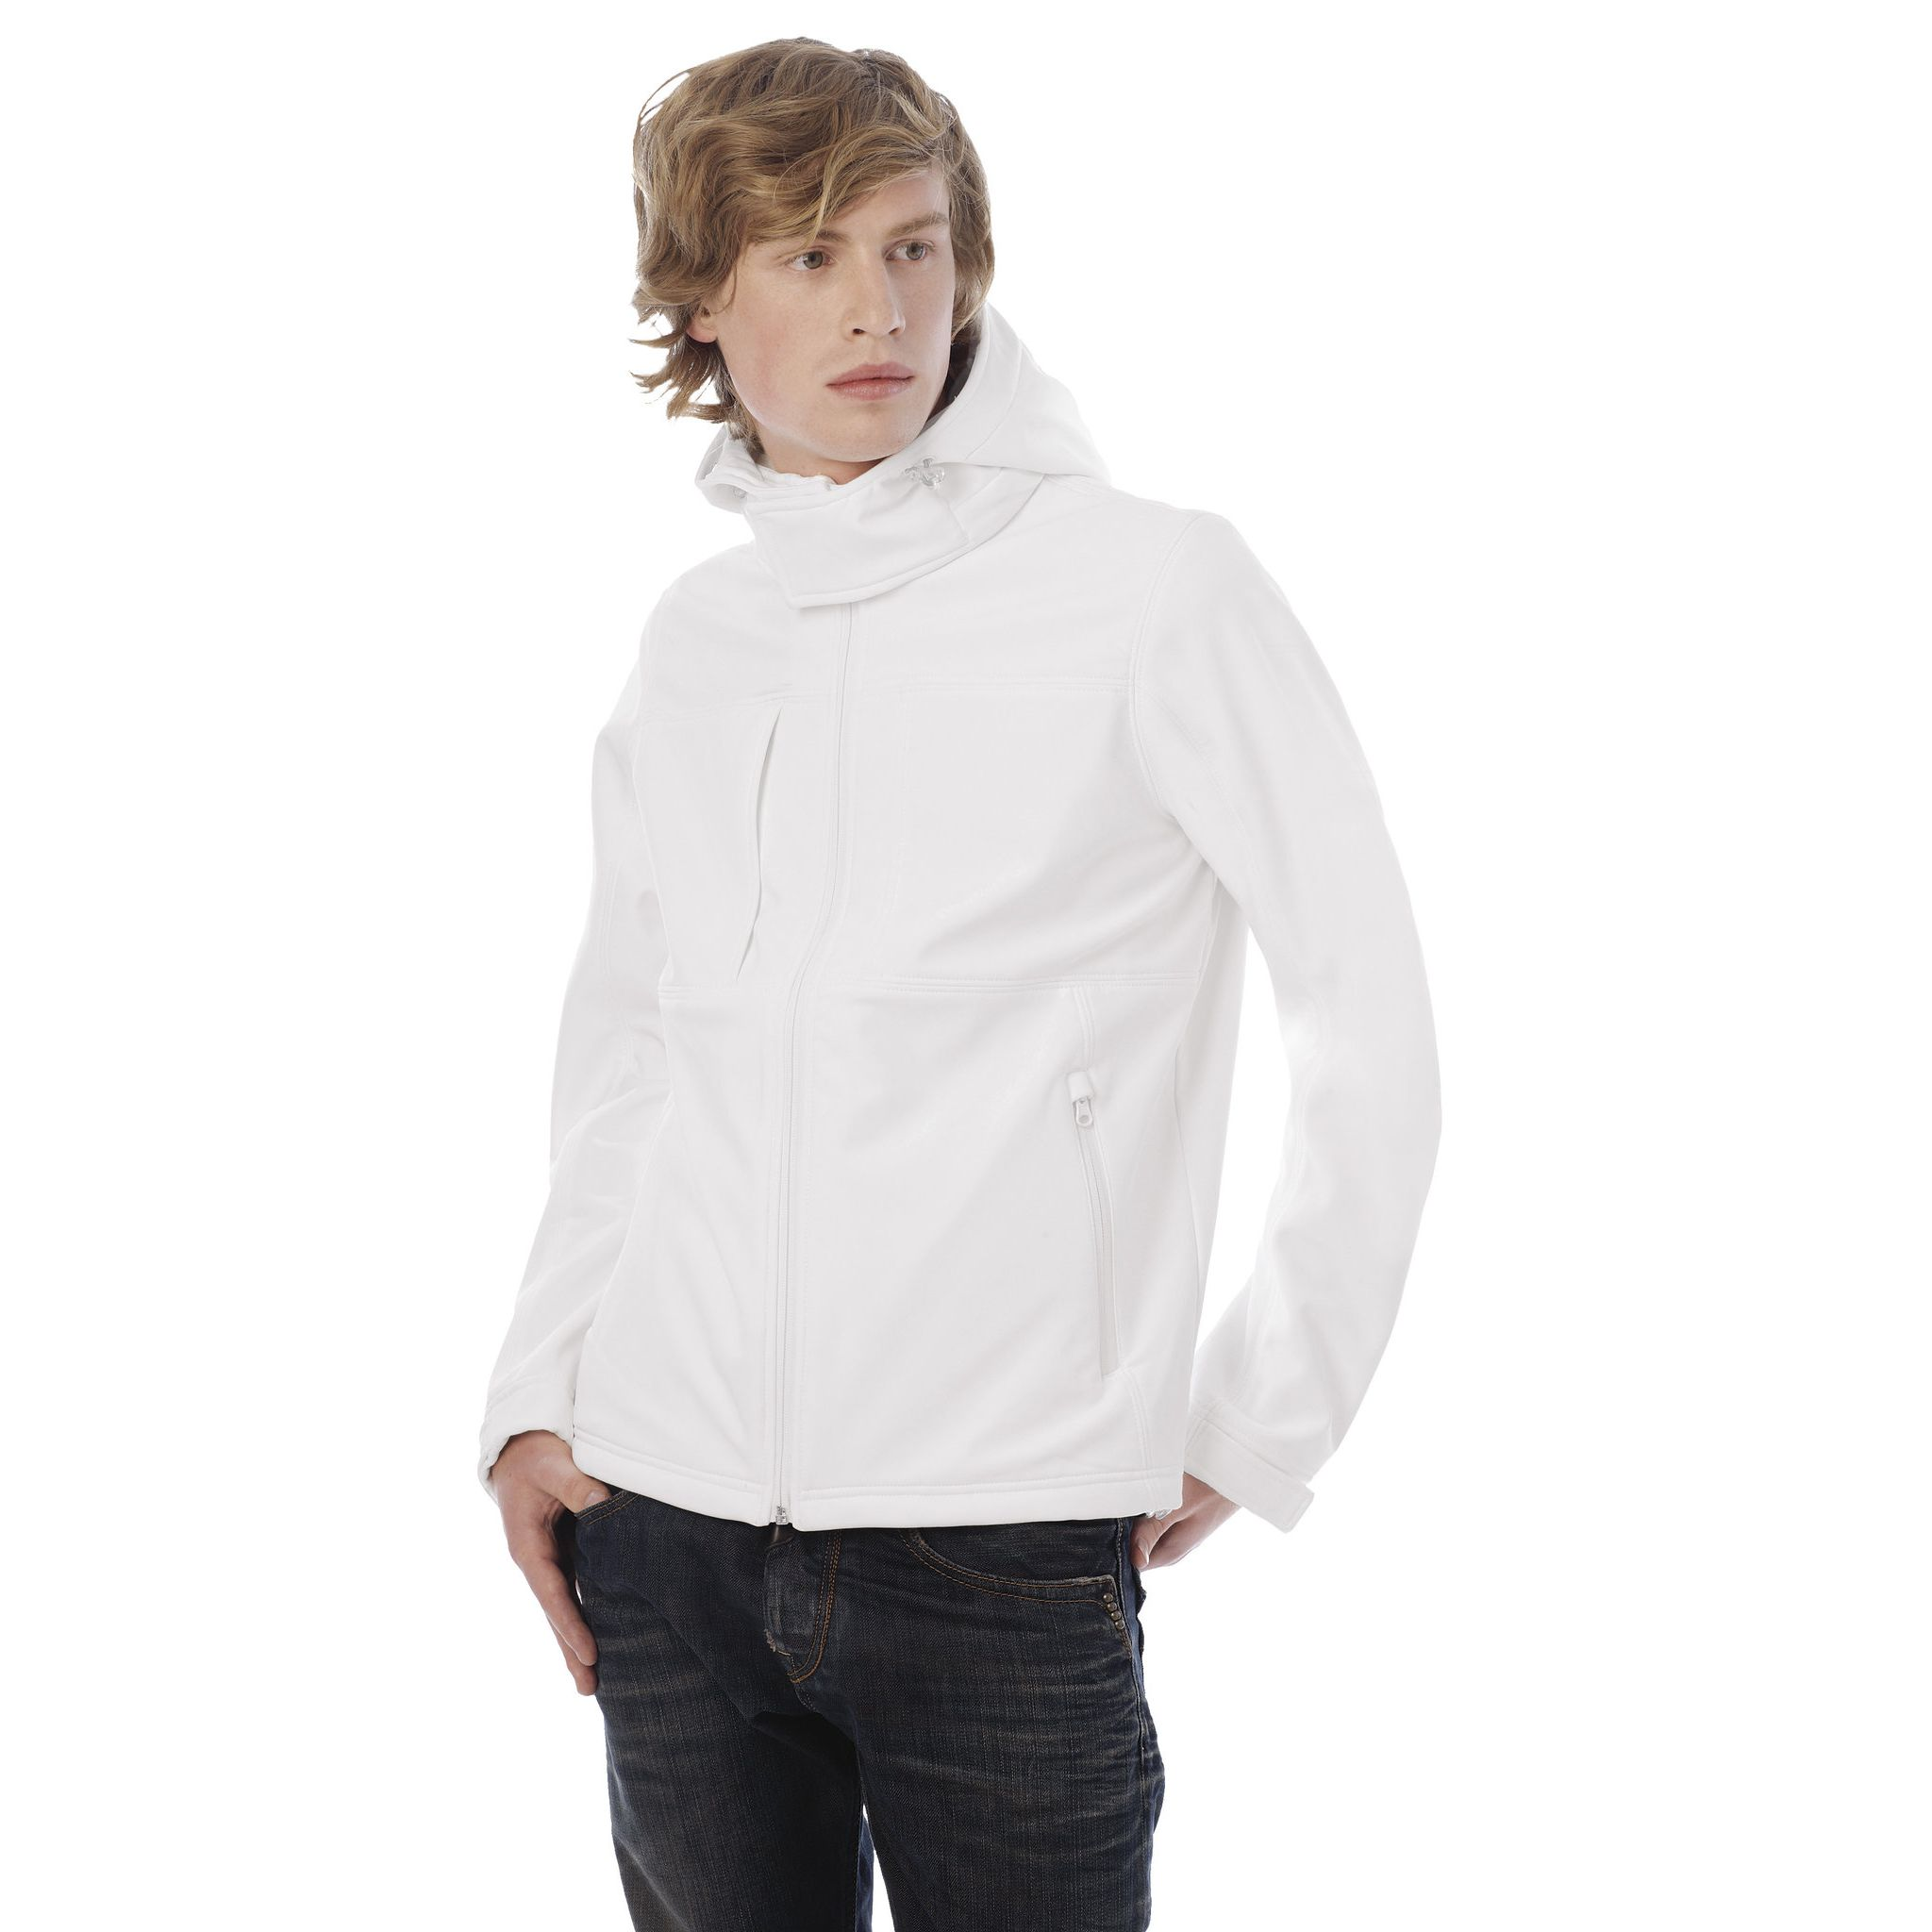 hooded-soft-shell-men-veste-soft-shell-homme-a-capuche